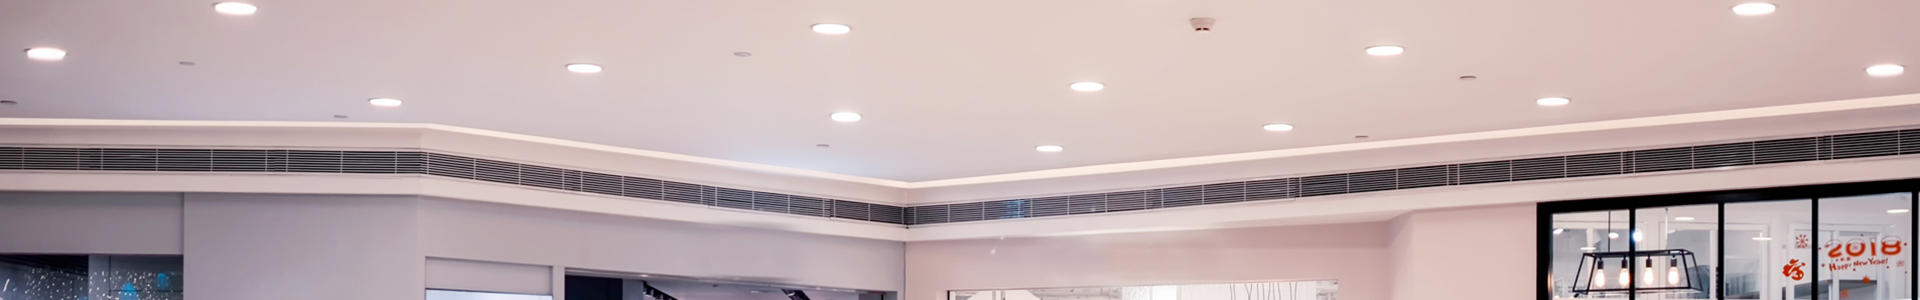 4 inch led downlight